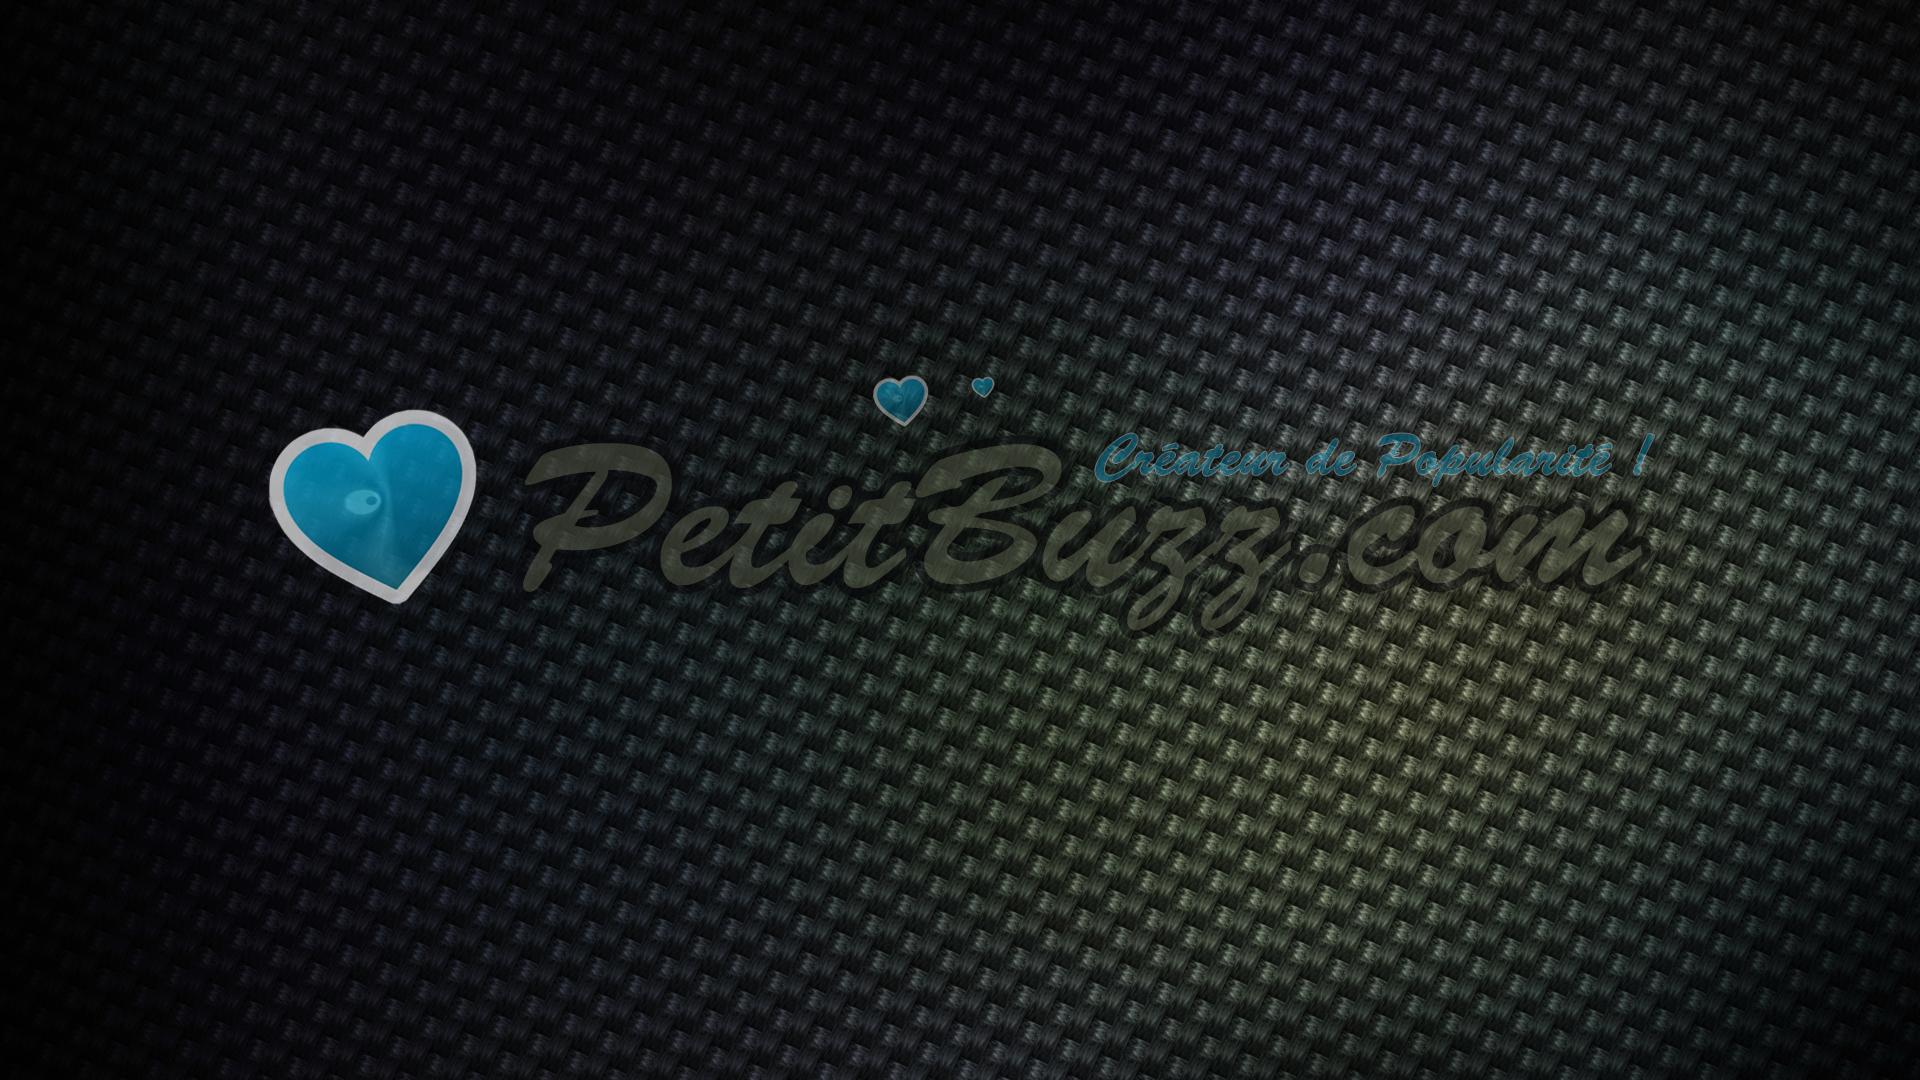 Petit Buzz Collection